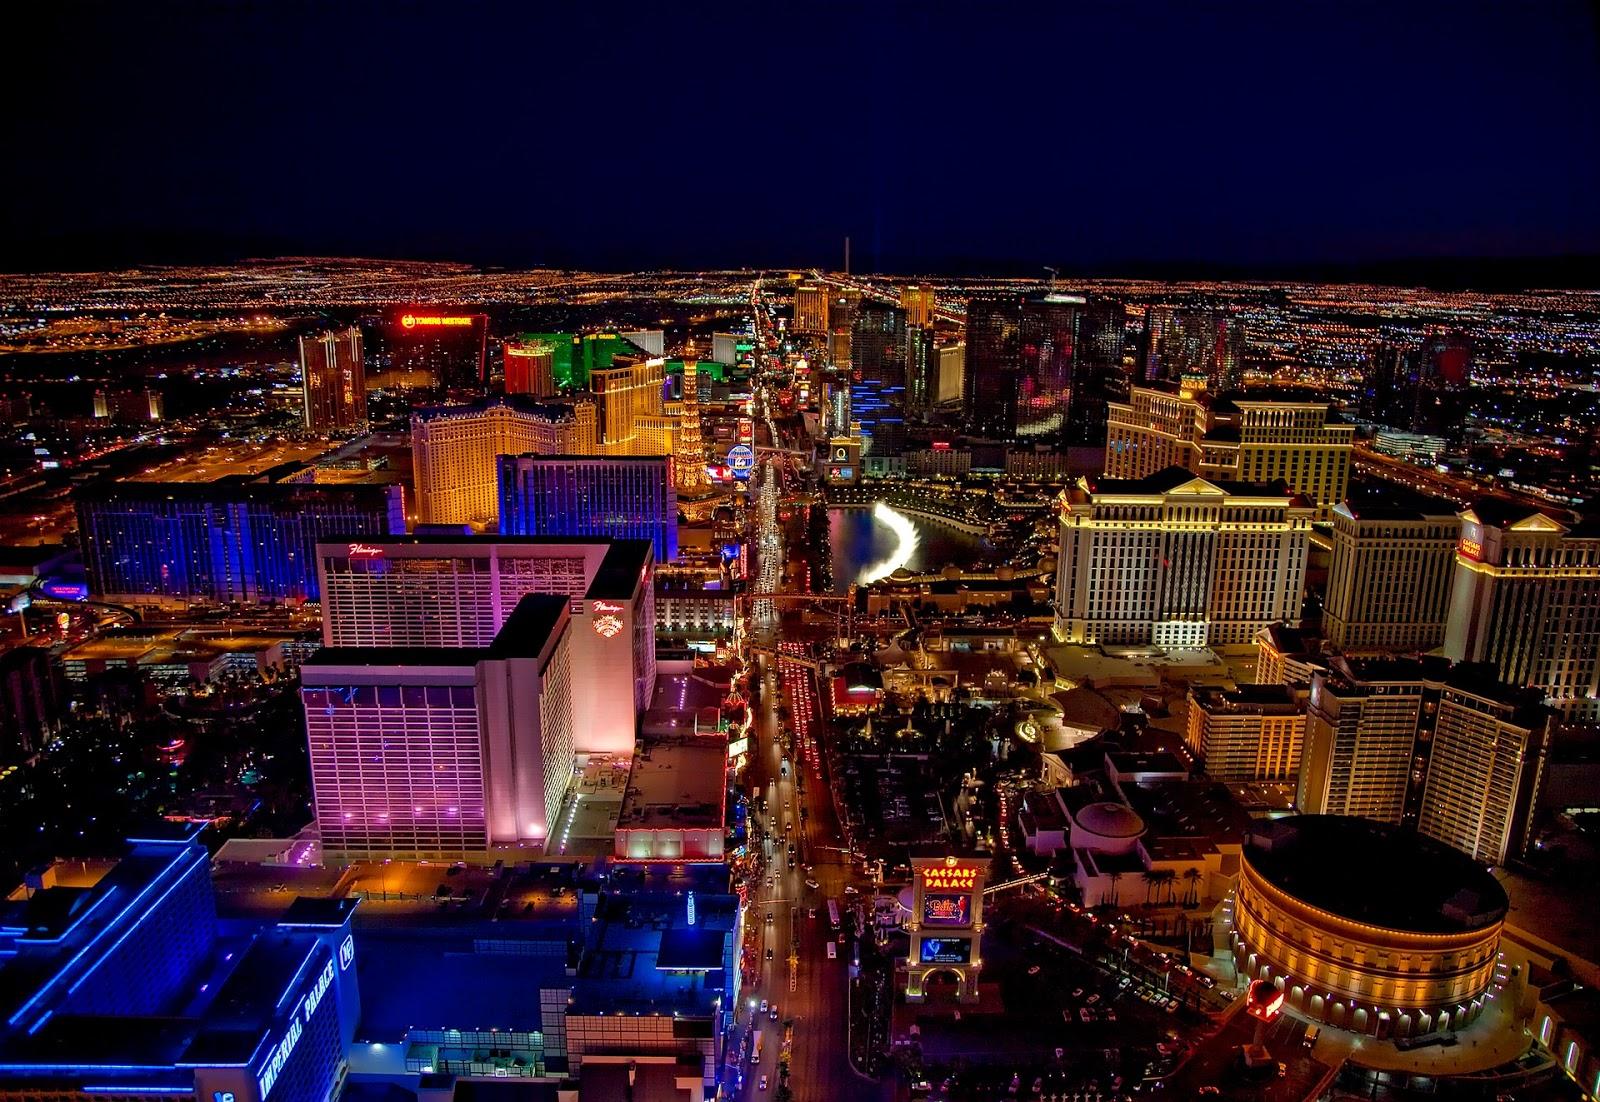 The city of Las Vegas at night.